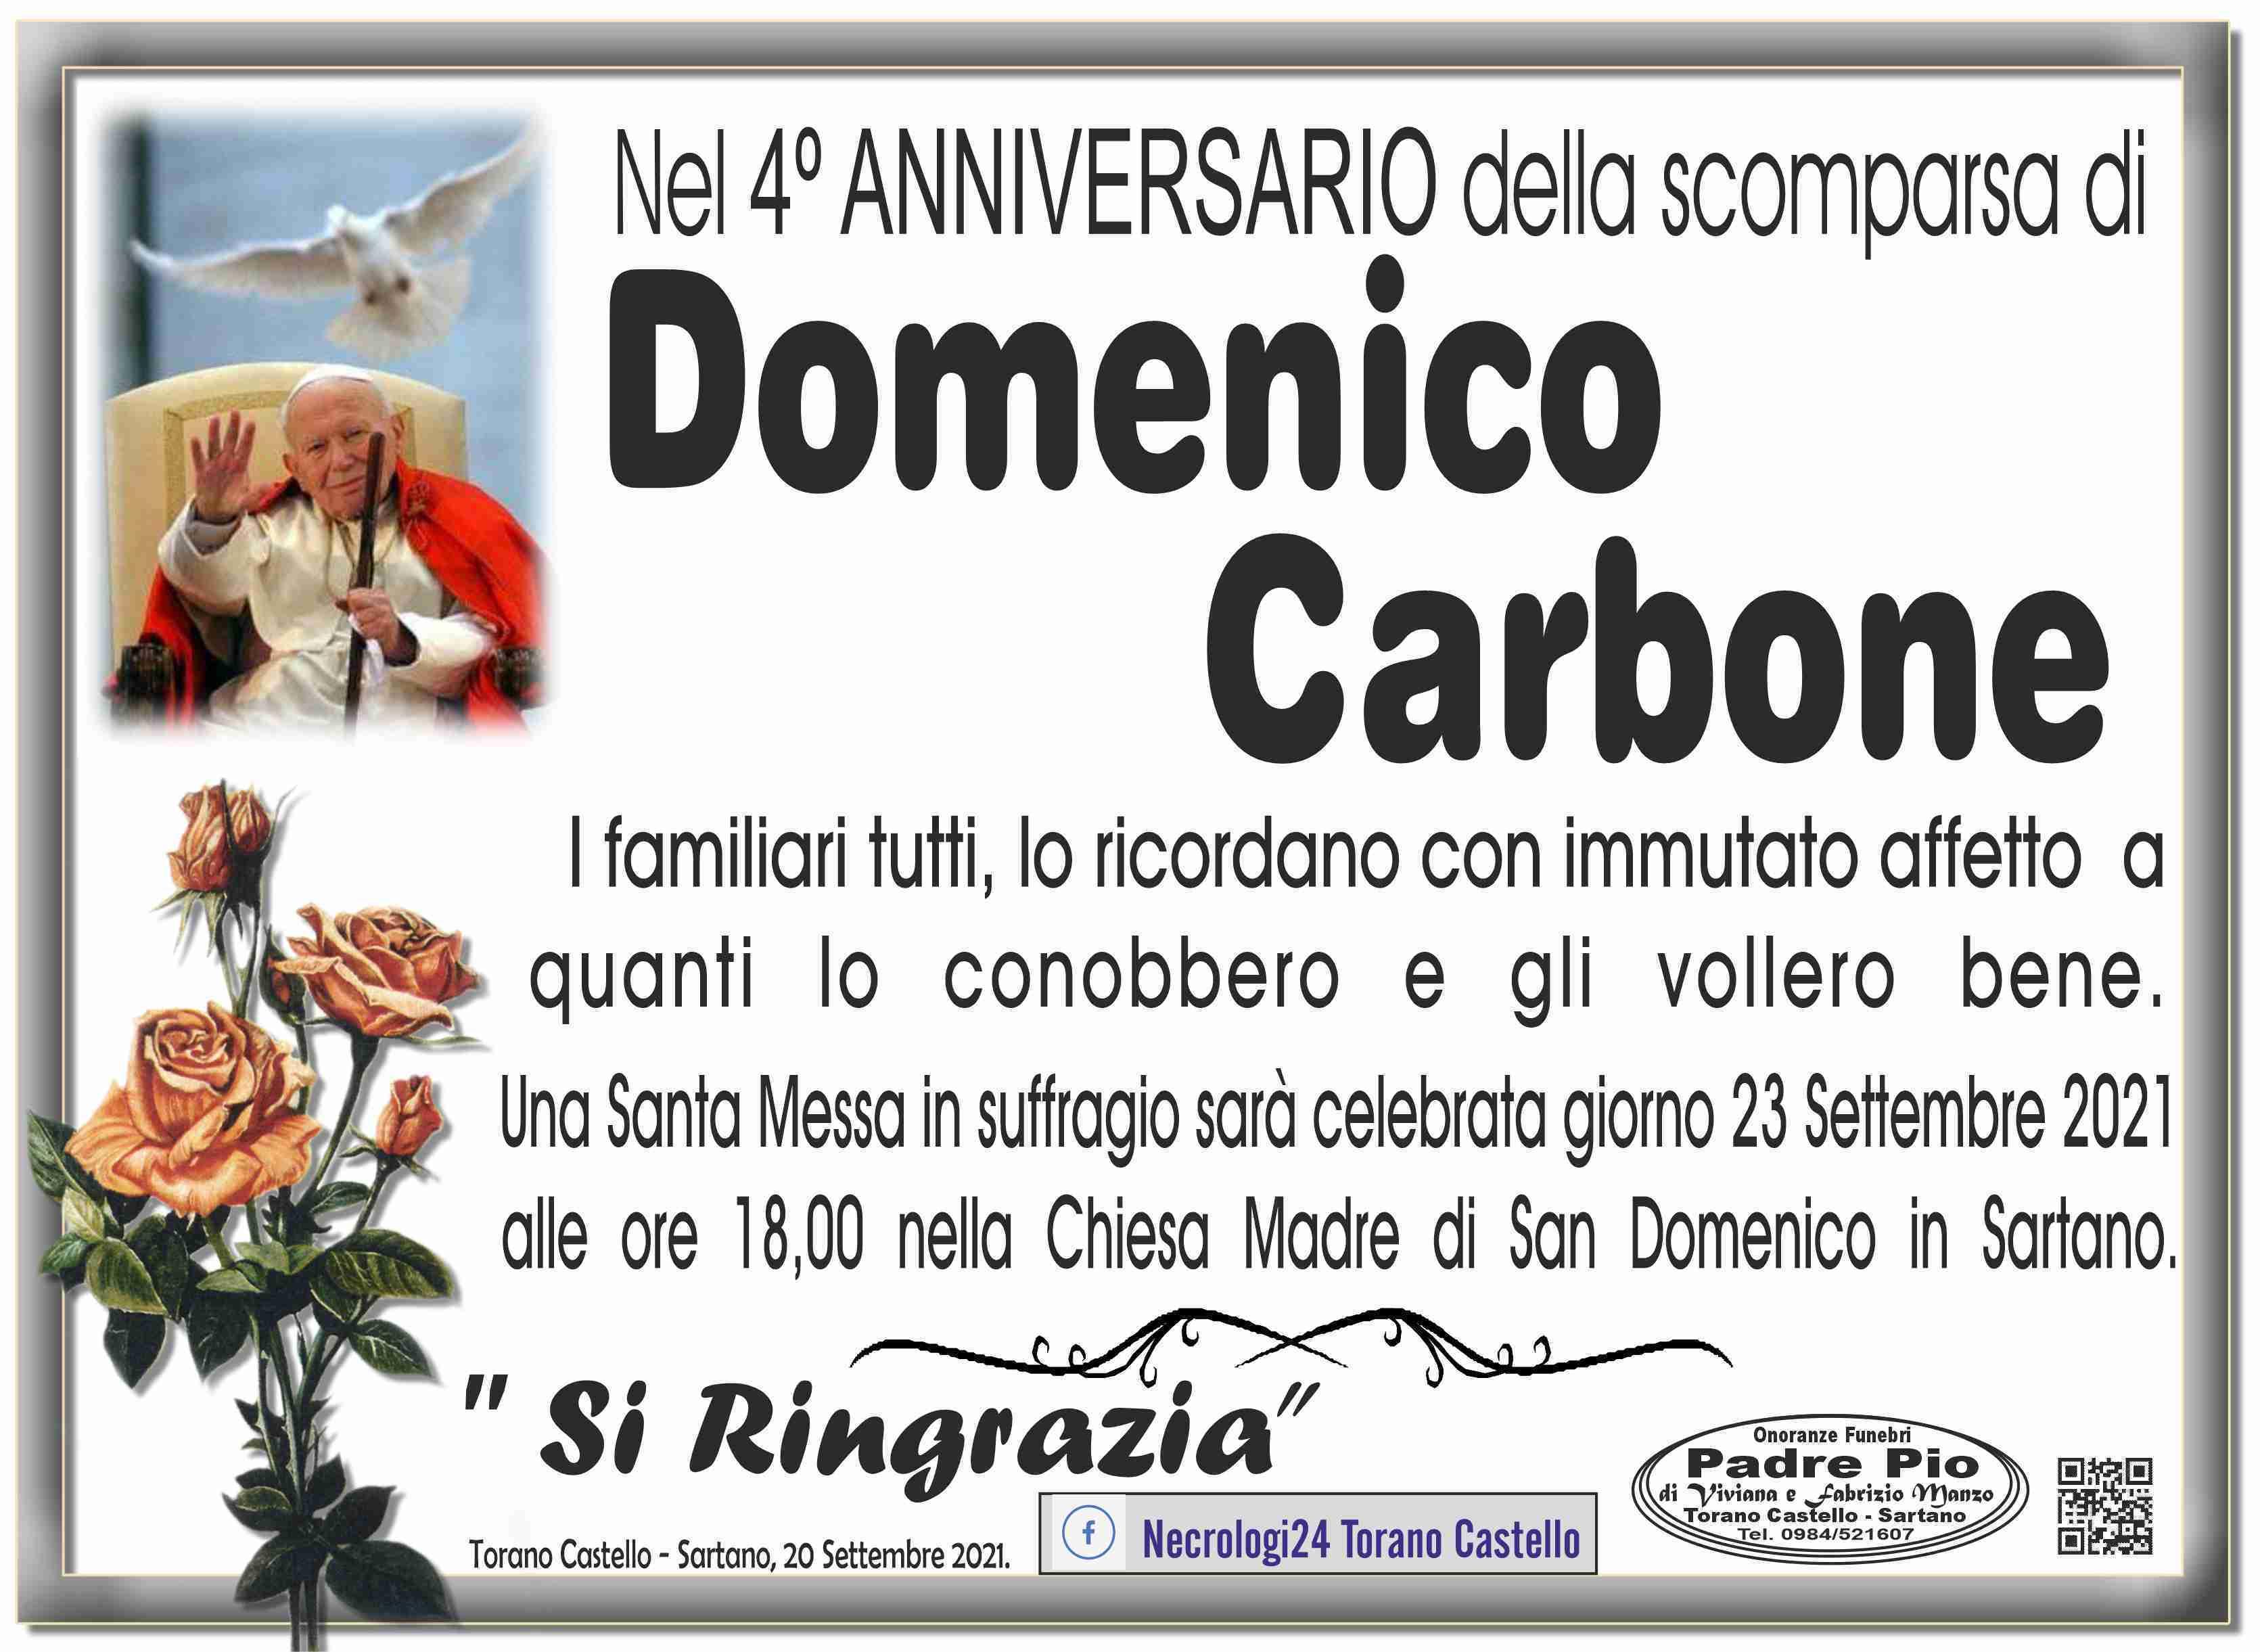 Domenico Carbone